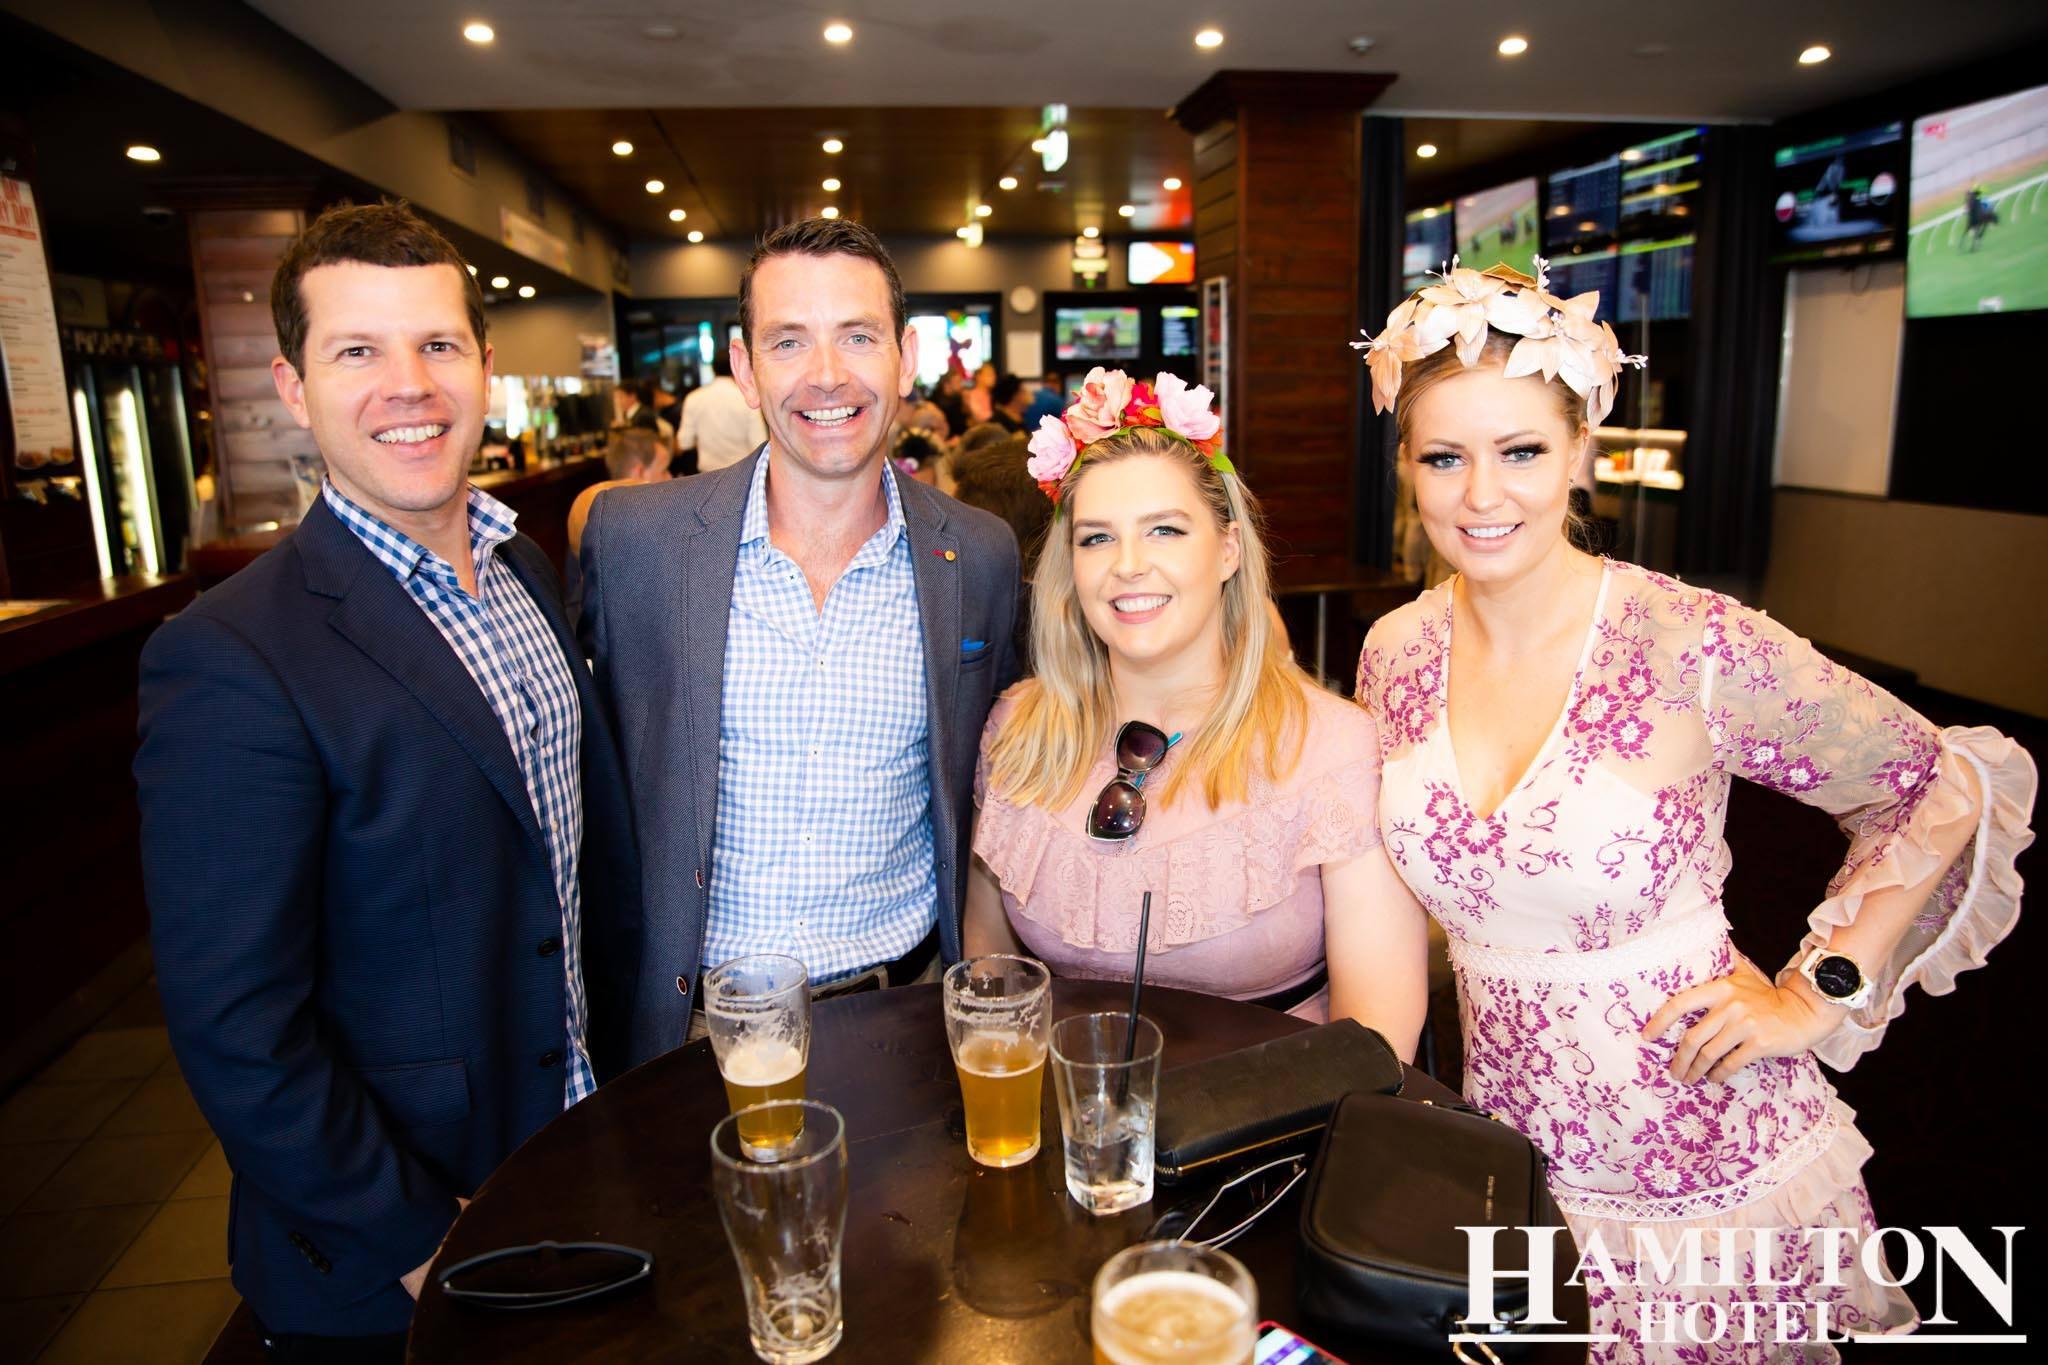 Melbourne-Cup-Hamilton-Hotel-Hamilton,QLD (7).jpg